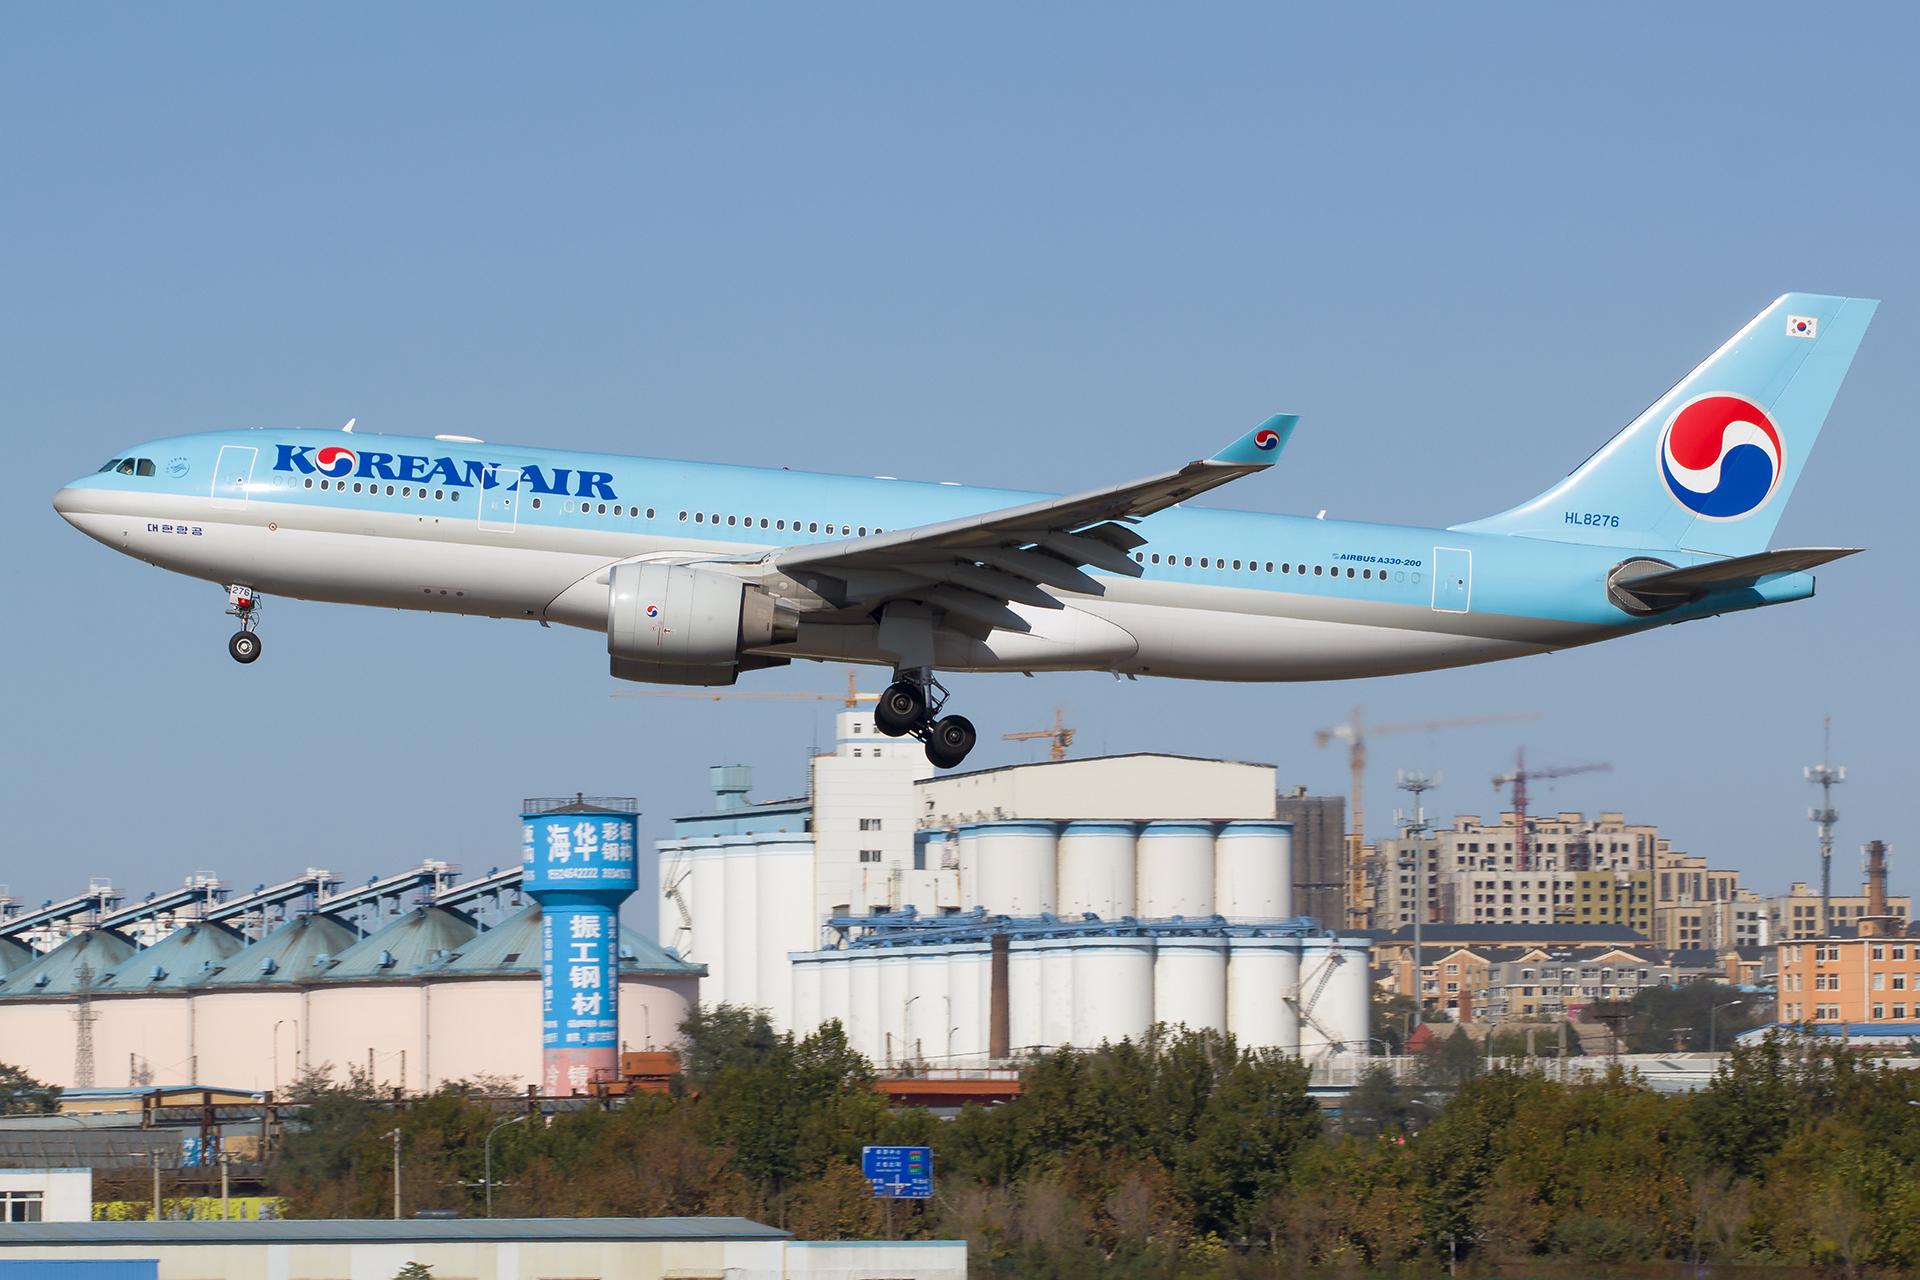 Re:[原创][DLC]。。。宽体三张 。。。 AIRBUS A330-200 HL8276 中国大连国际机场